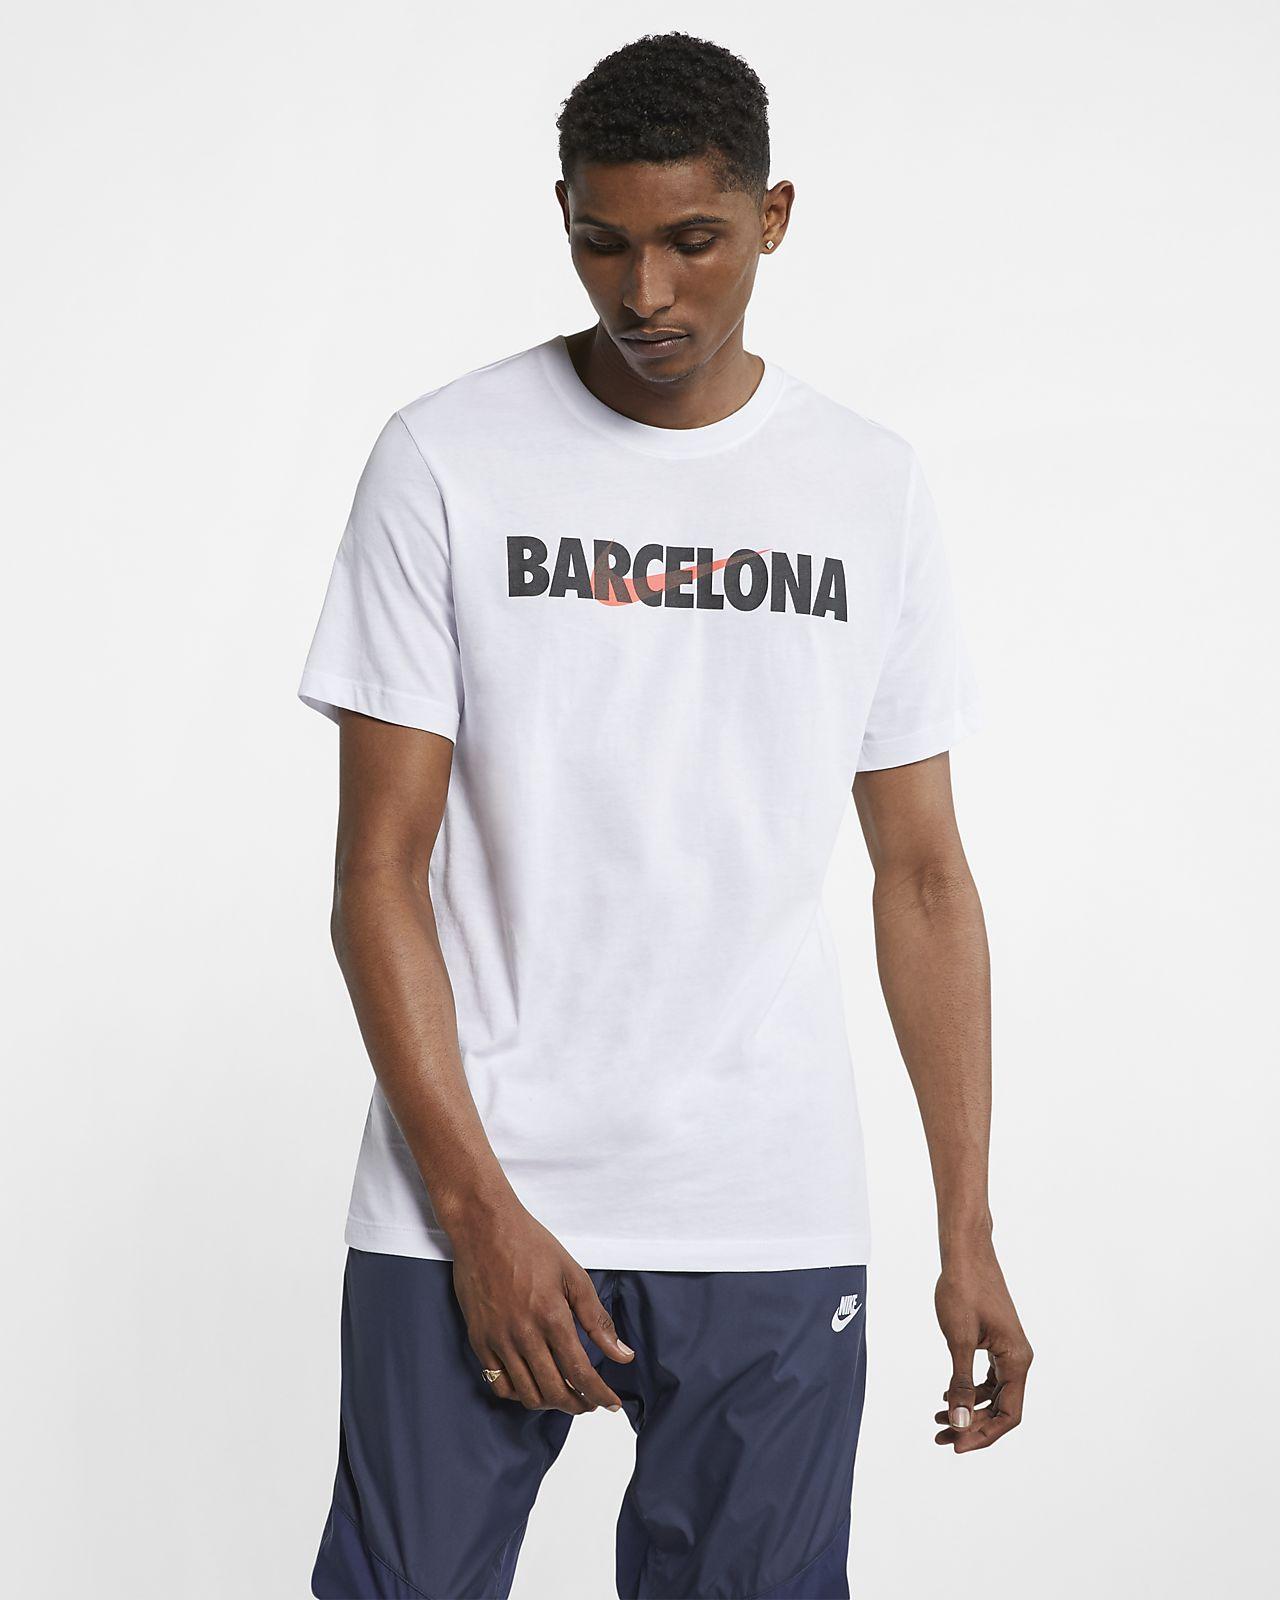 outlet on sale delicate colors super cute Nike Sportswear Men's T-Shirt